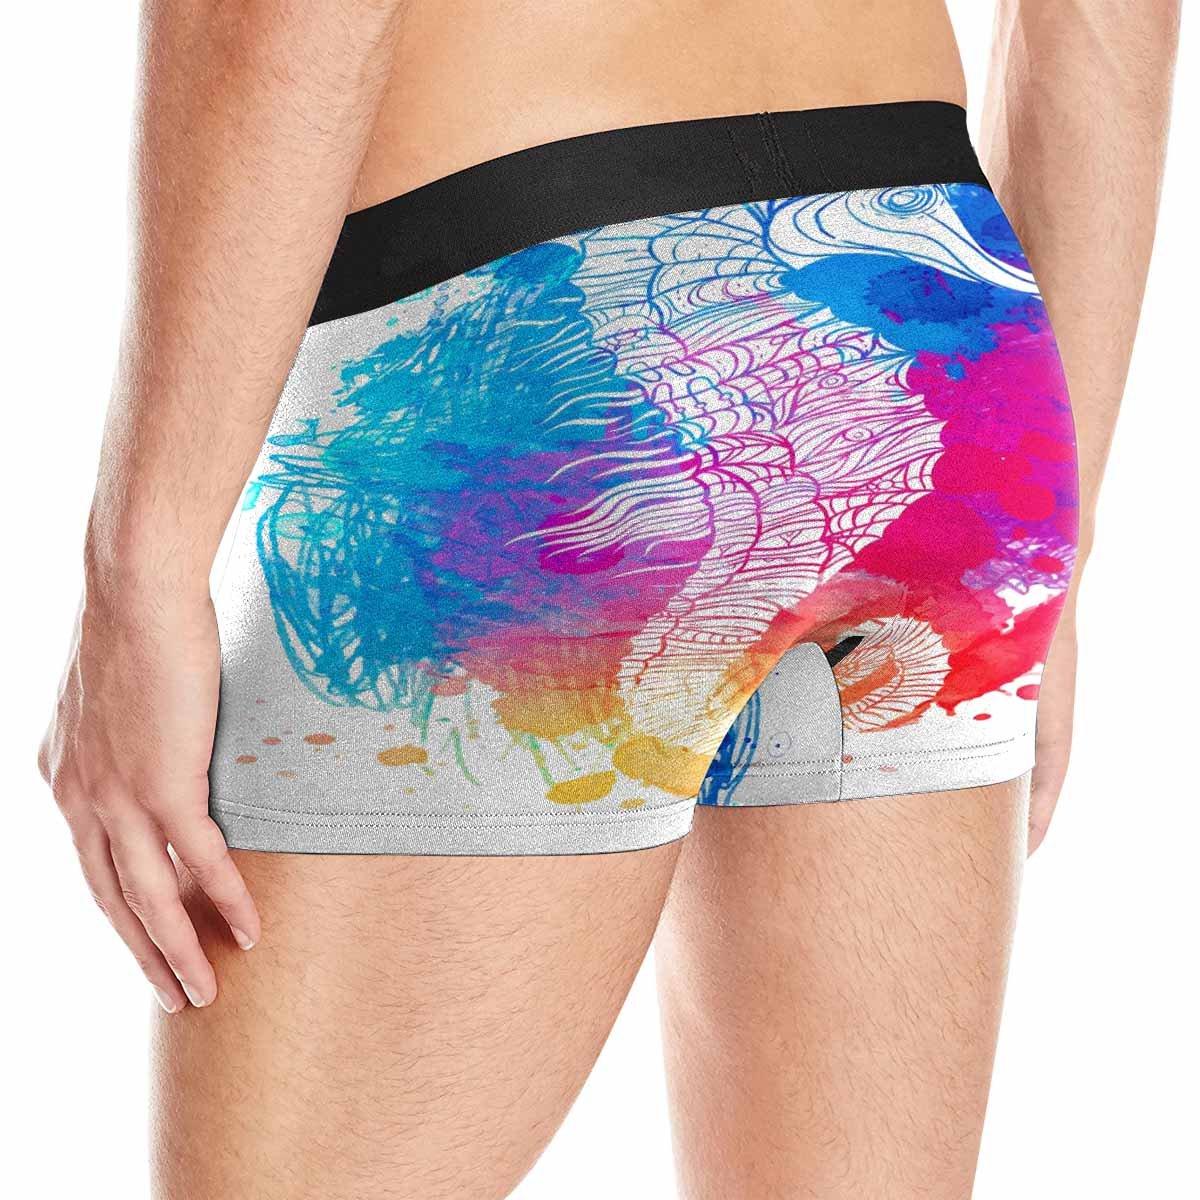 INTERESTPRINT Boxer Briefs Mens Underwear XS-3XL XXL Rainbow Seahorse Vivid Watercolor